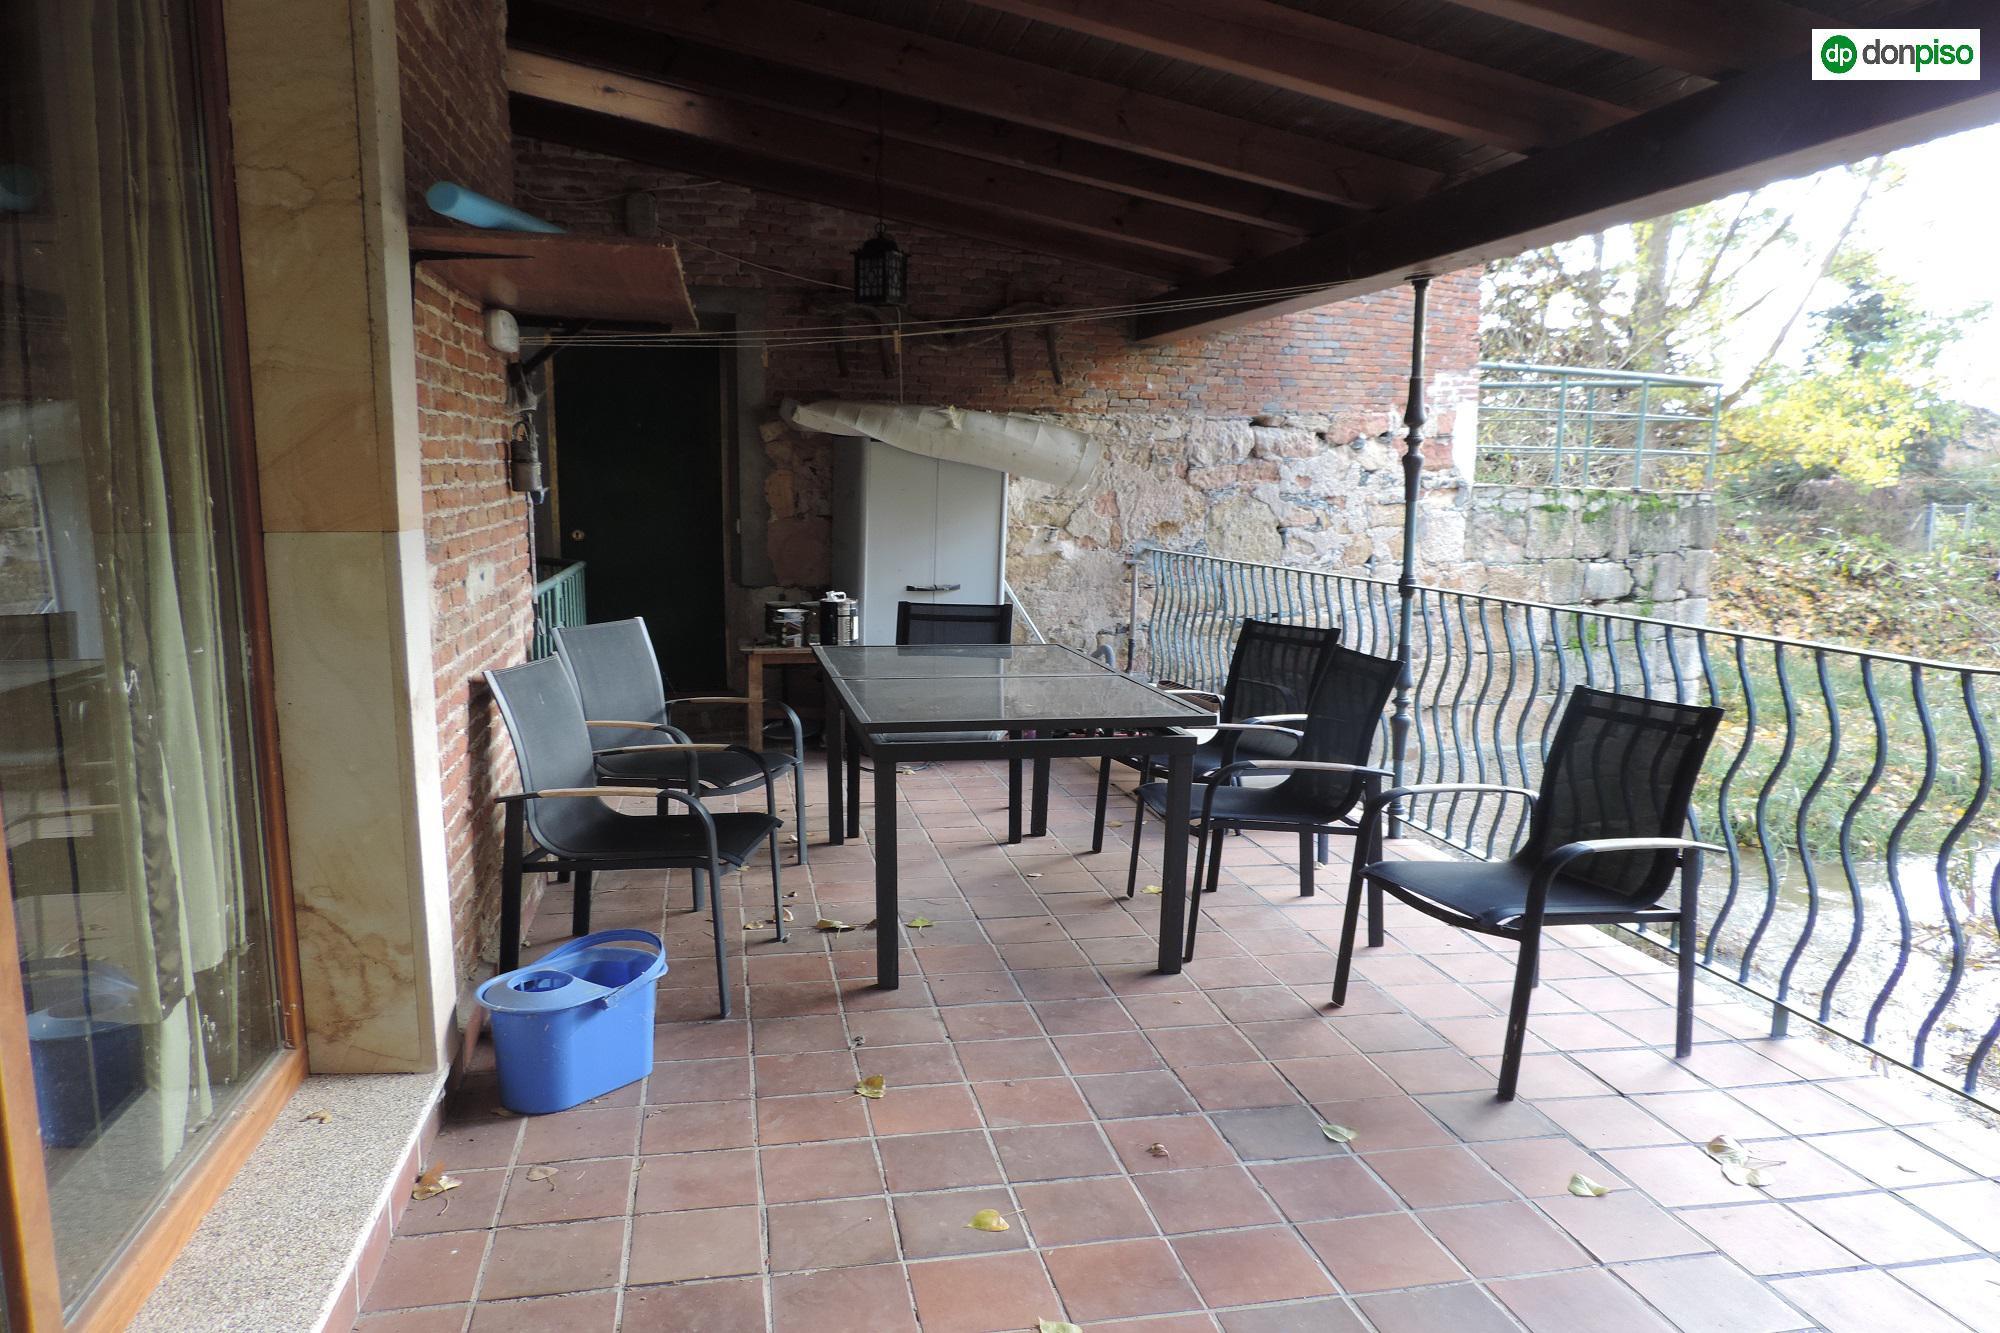 217550 - Huerta (Salamanca)